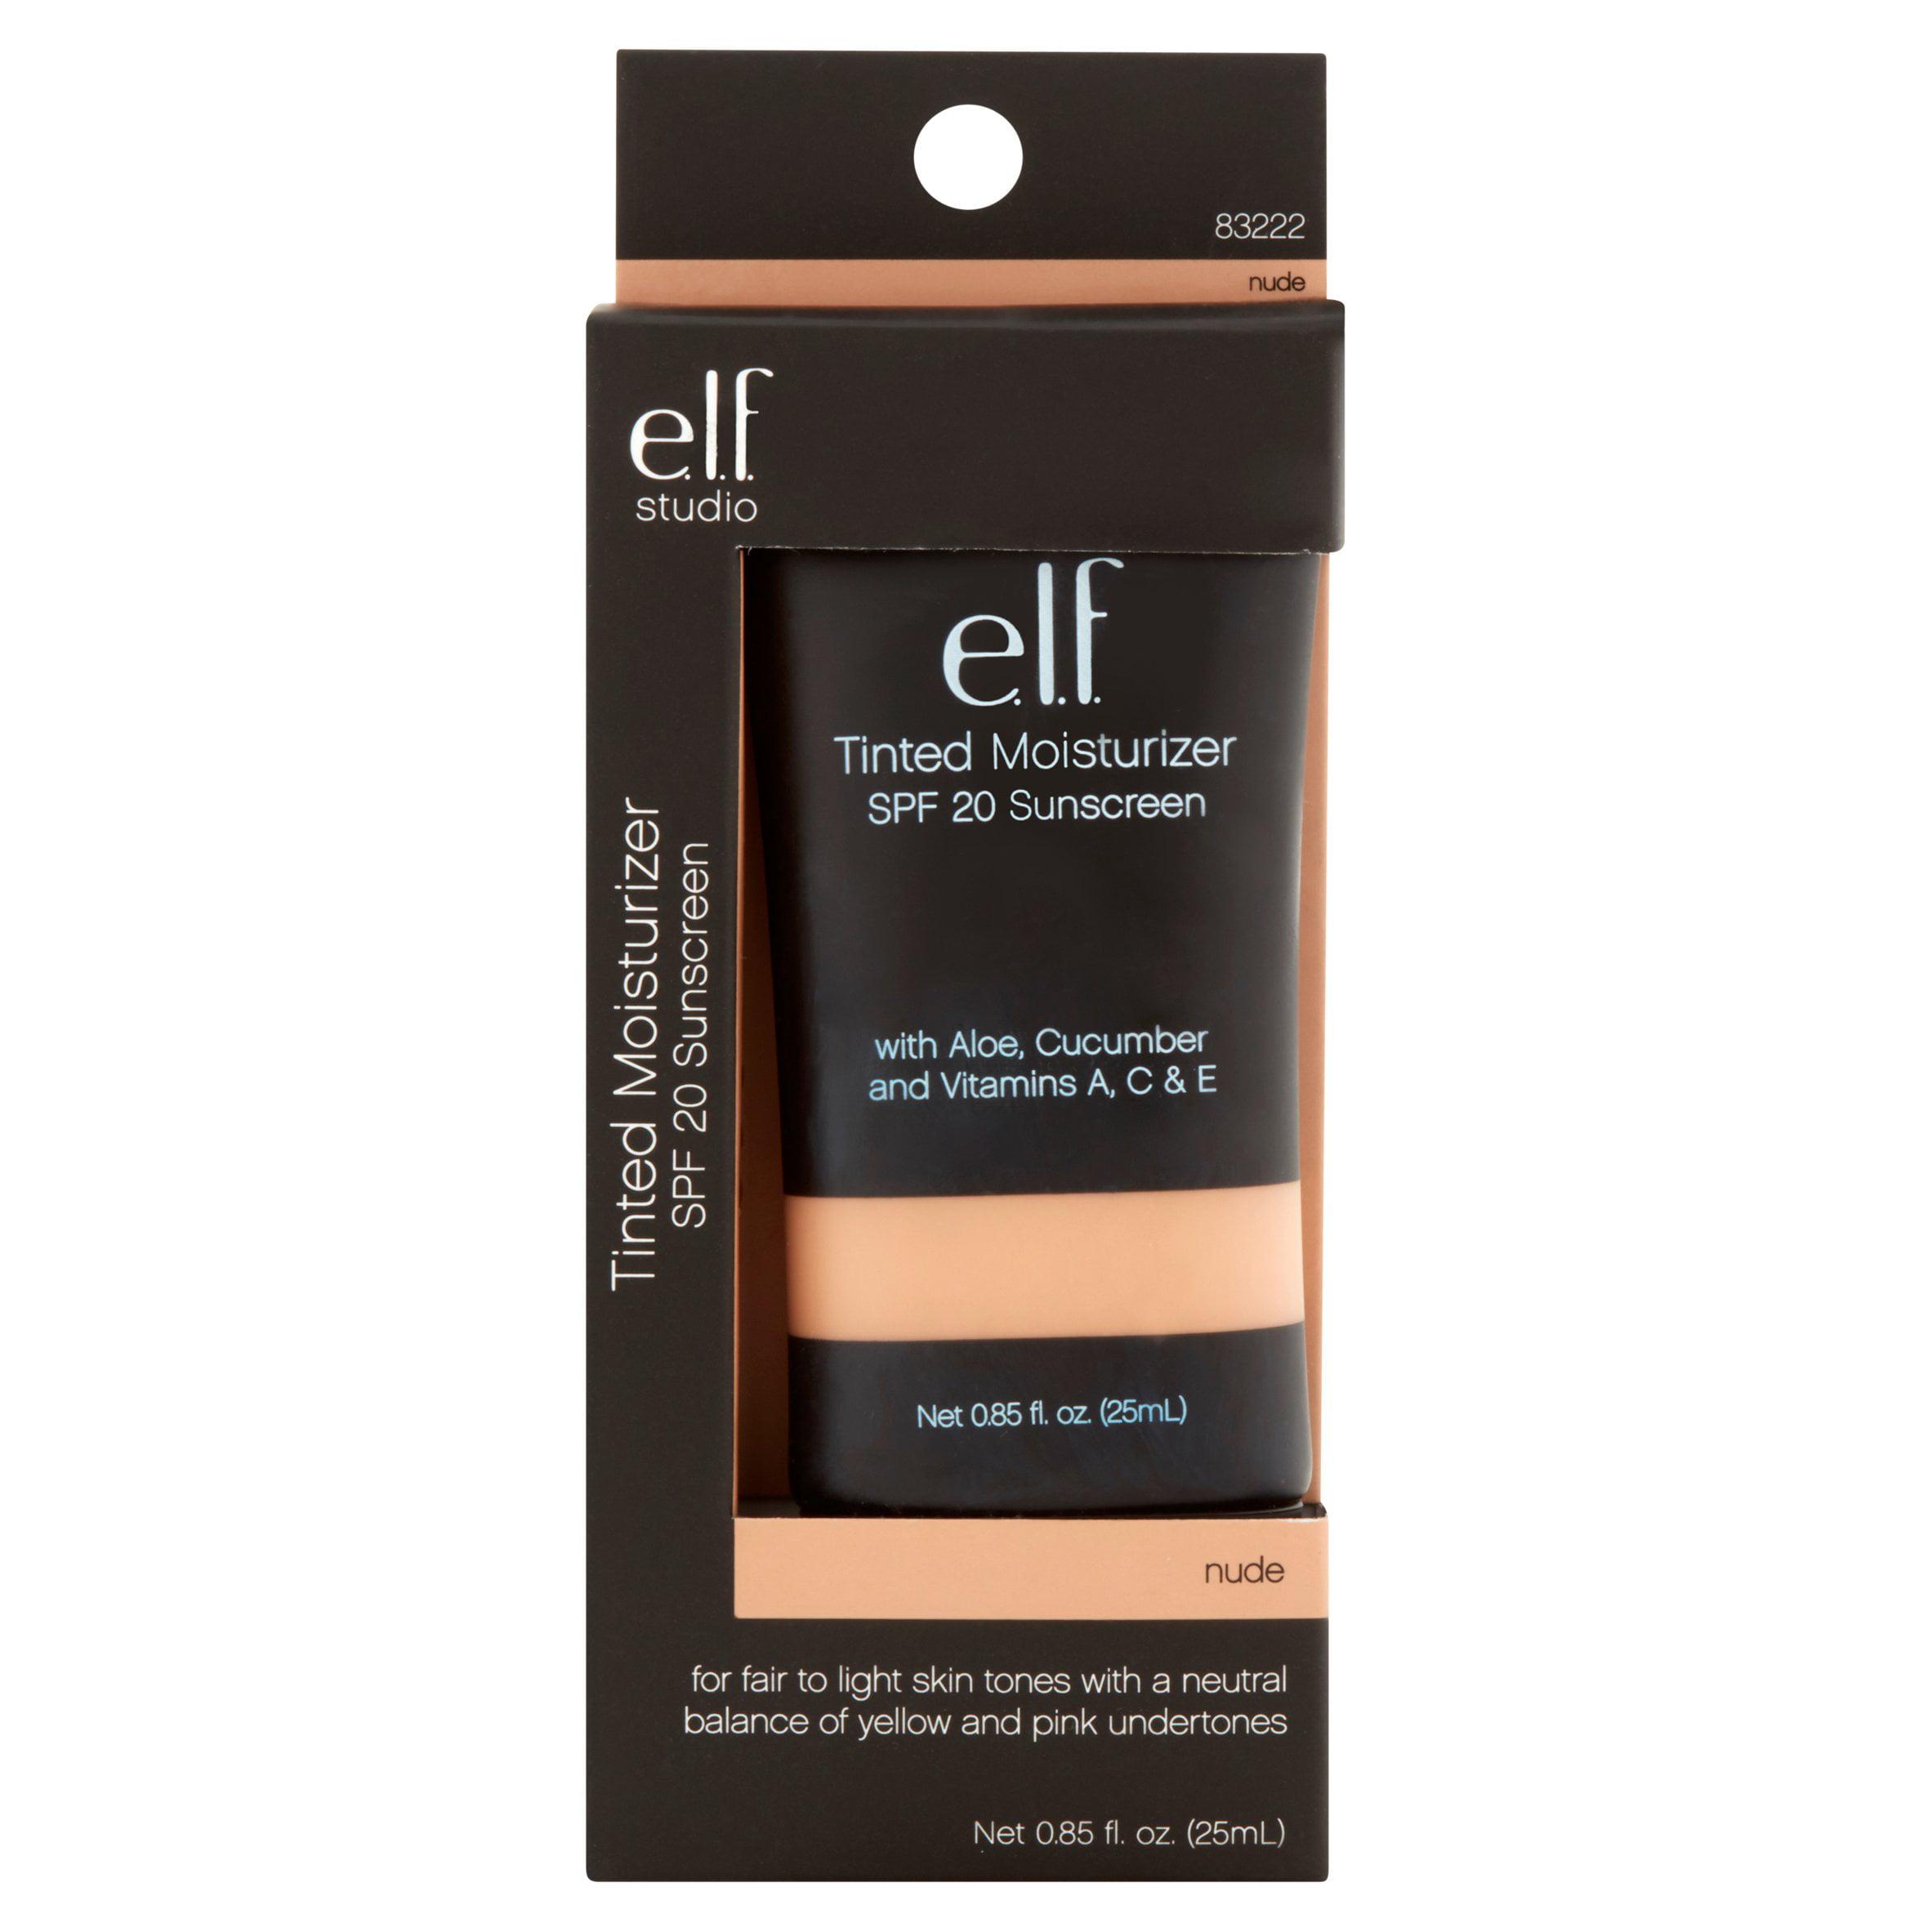 e.l.f. Cosmetics Tinted Moisturizer, SPF 20, Nude, 0.88 fl oz